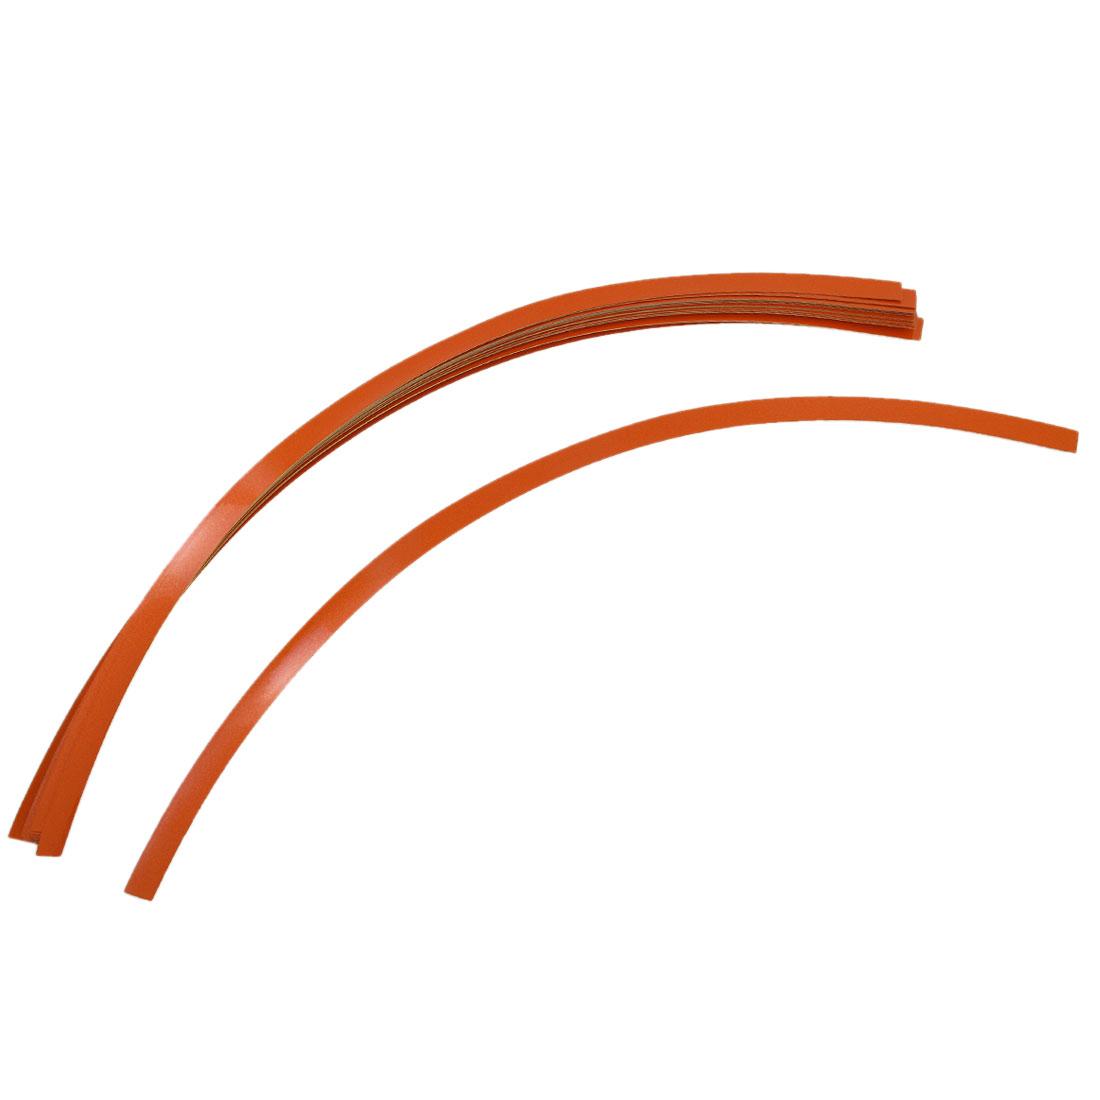 Motorcycle Car Tire Rim Stripe Tape Wheel Decorative Decal Sticker Orange 16pcs